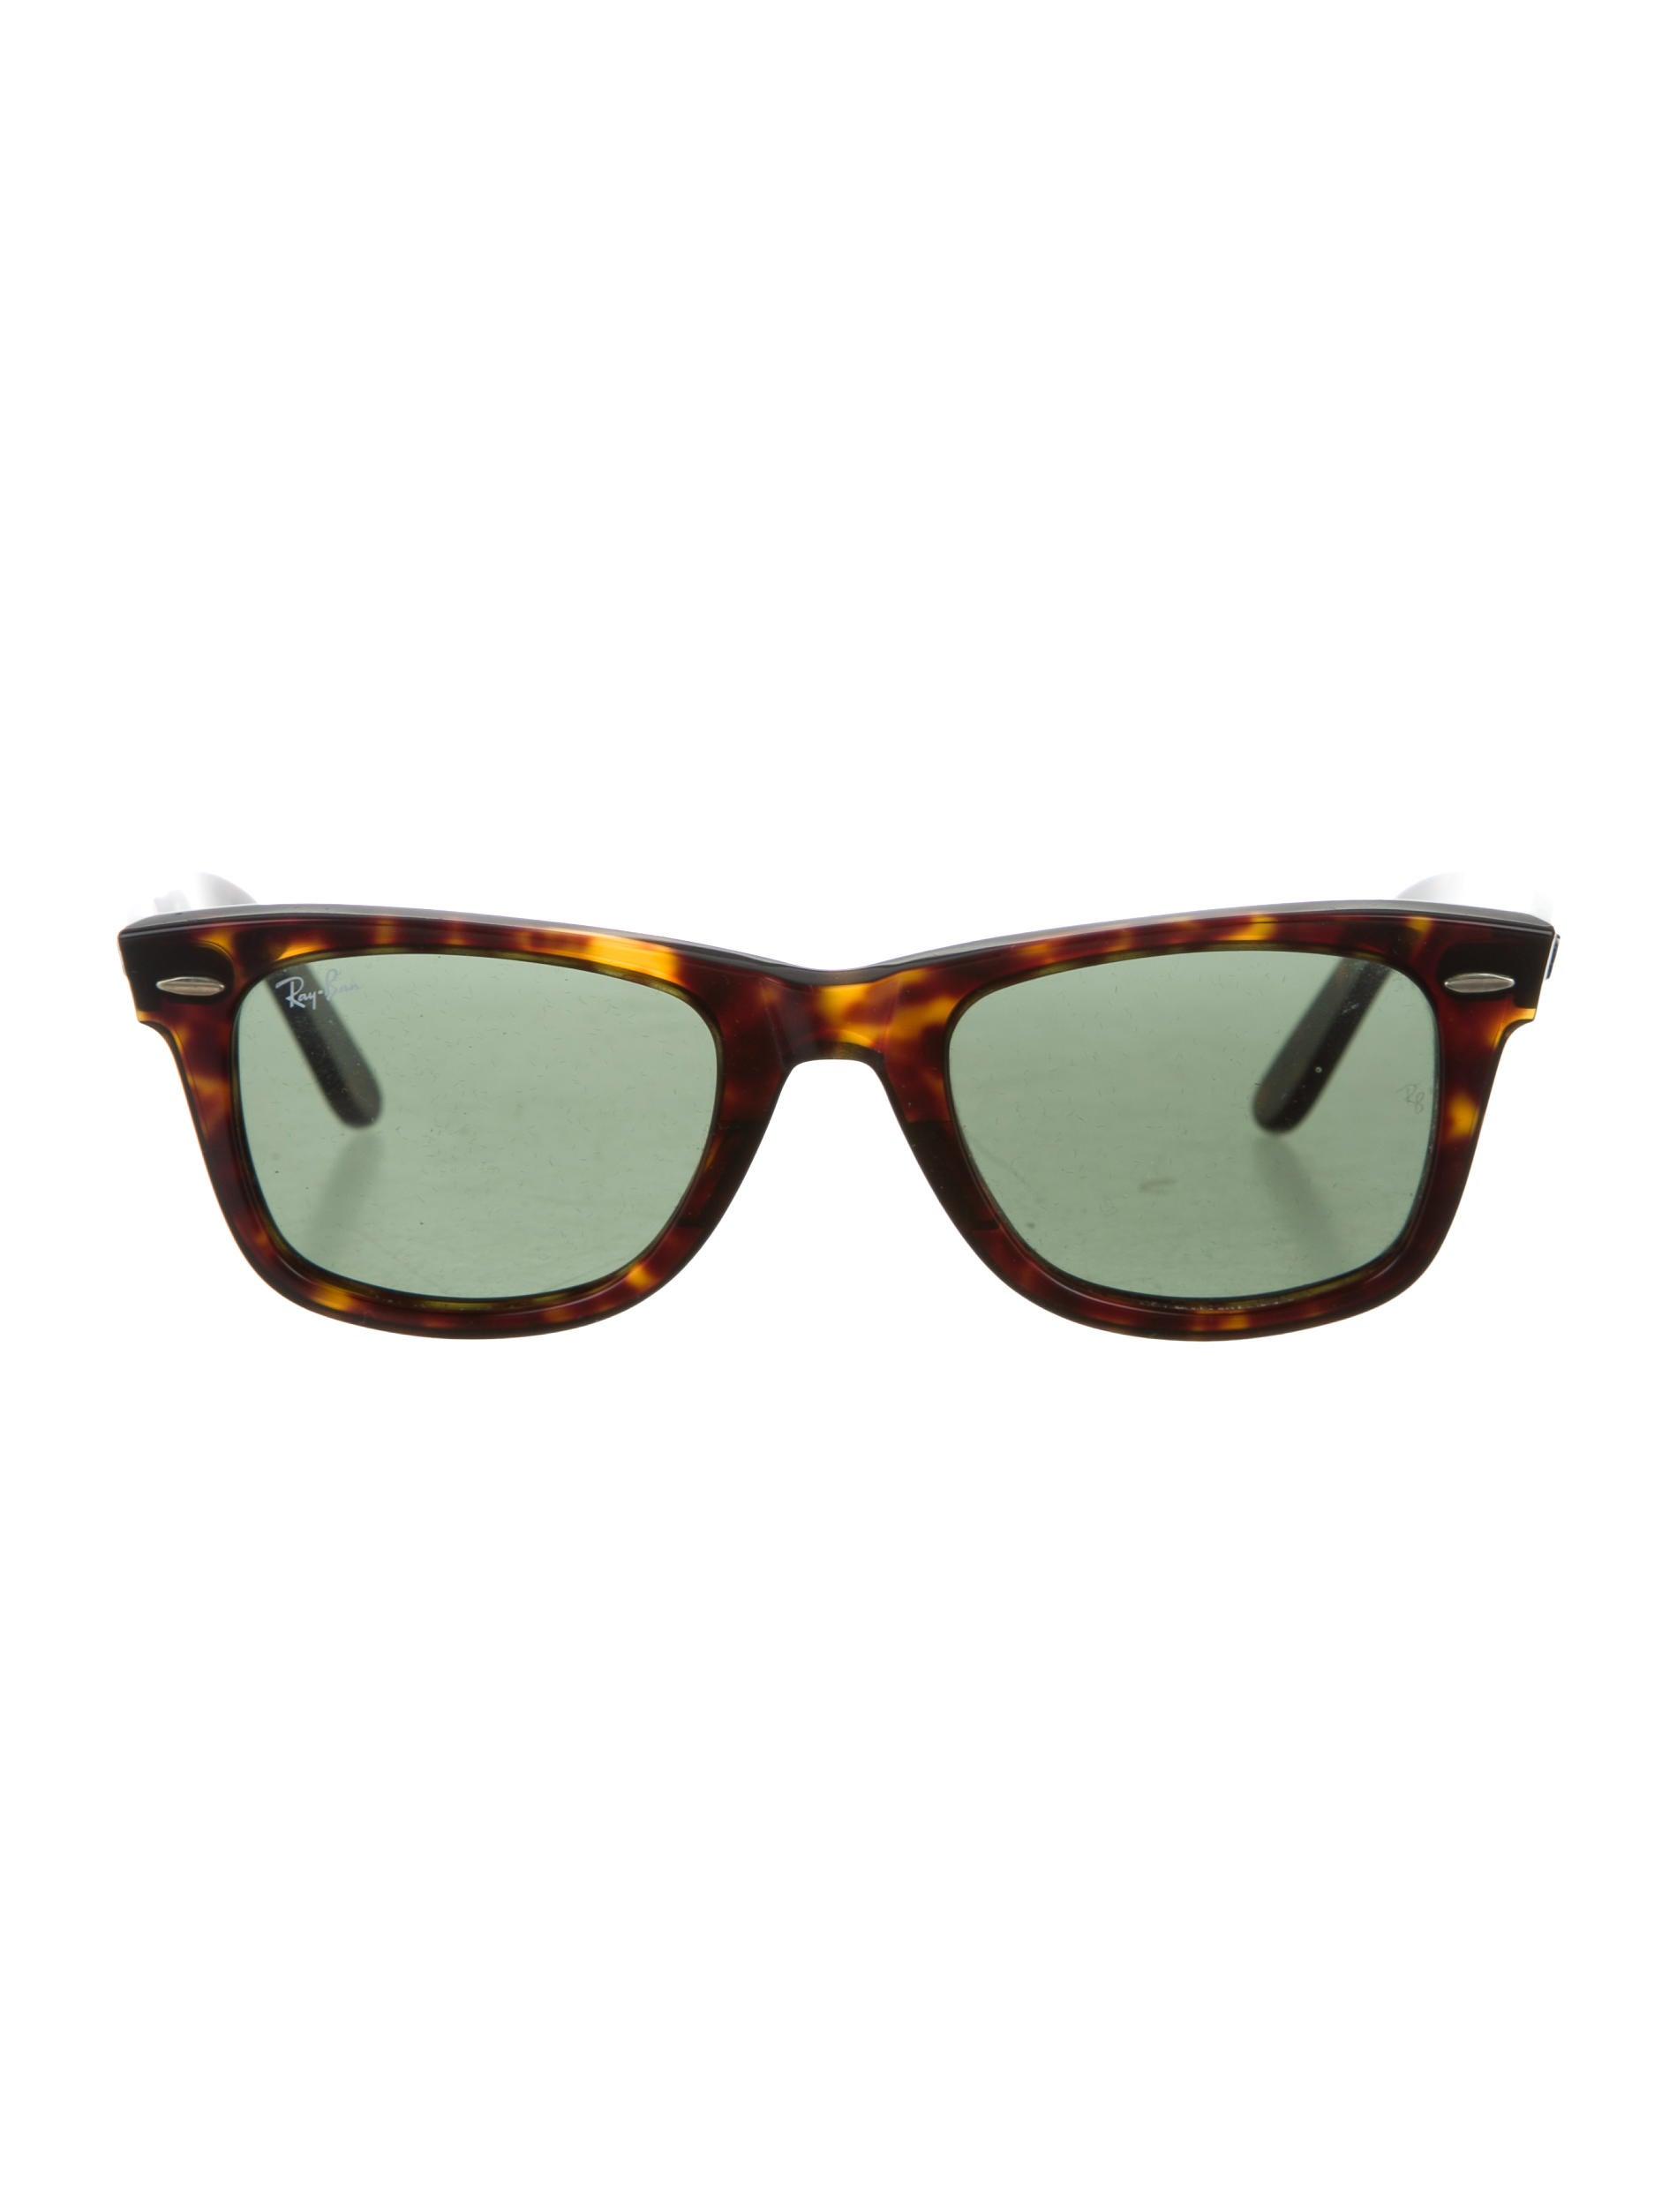 0dbd71bebce Ray Ban Tinted Sunglasses « Heritage Malta